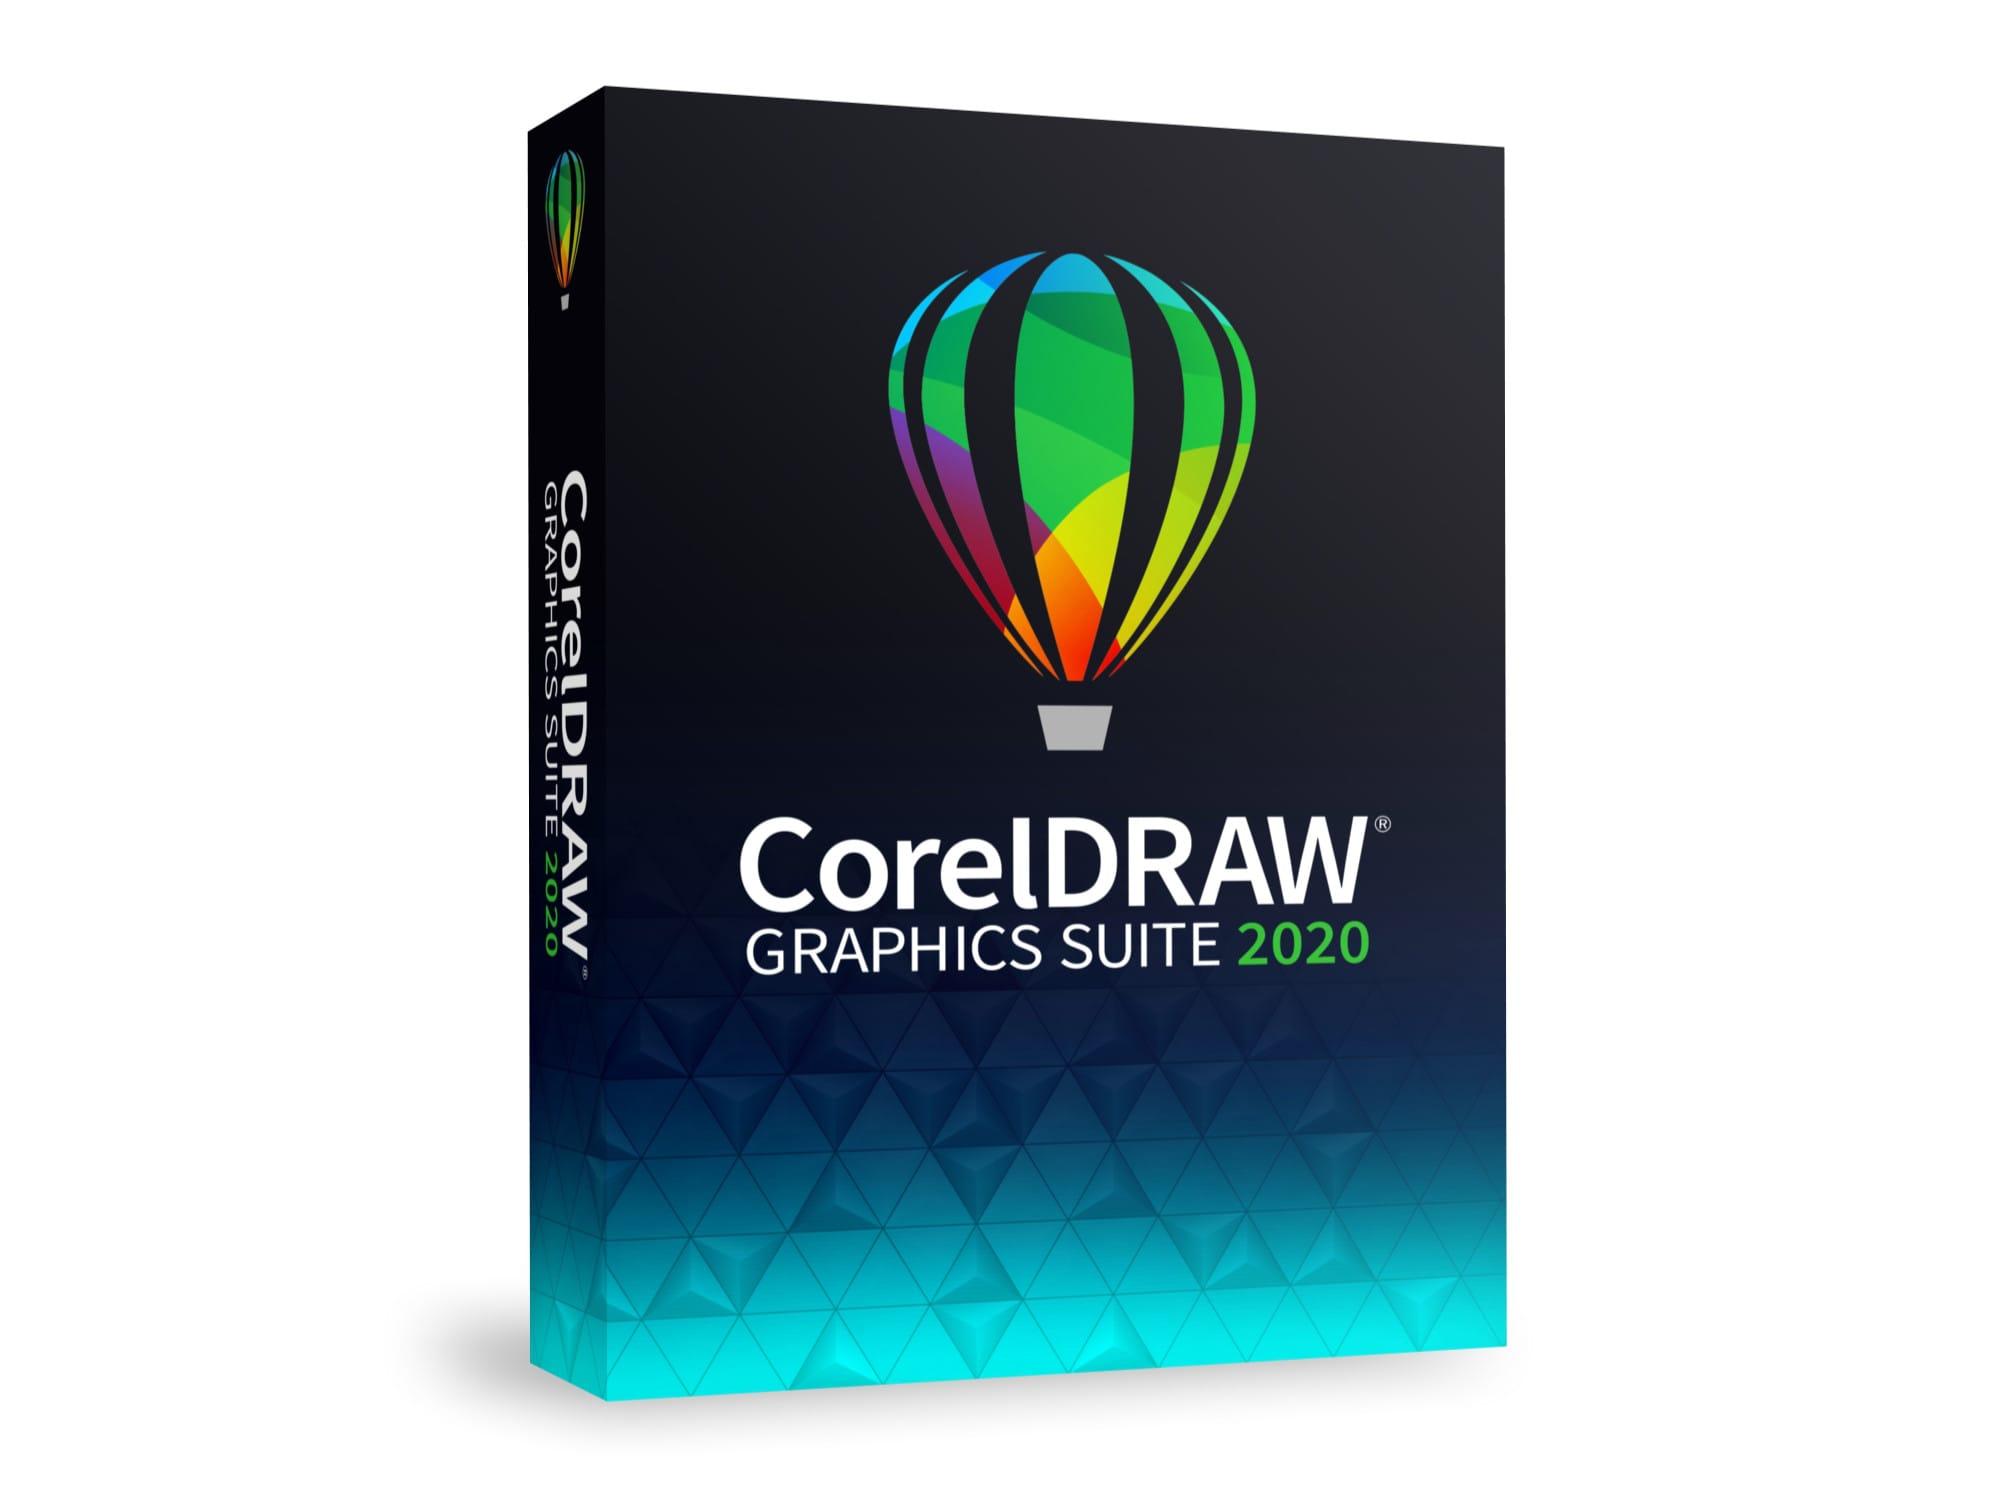 Image result for coreldraw 2020 box